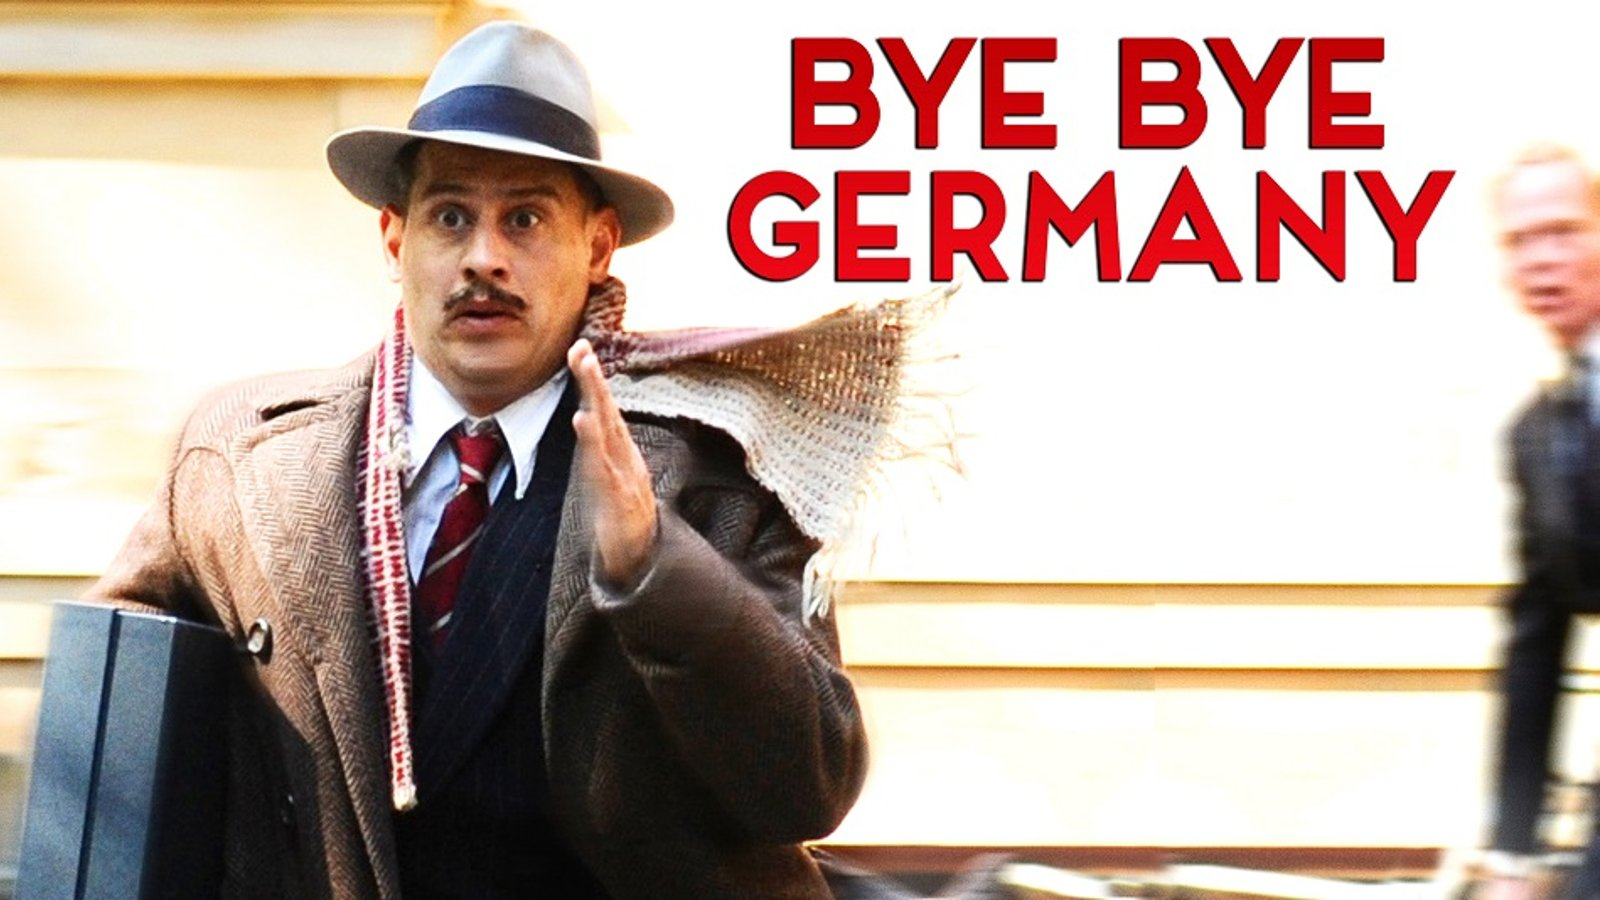 Bye Bye Germany - Es war einmal in Deutschland